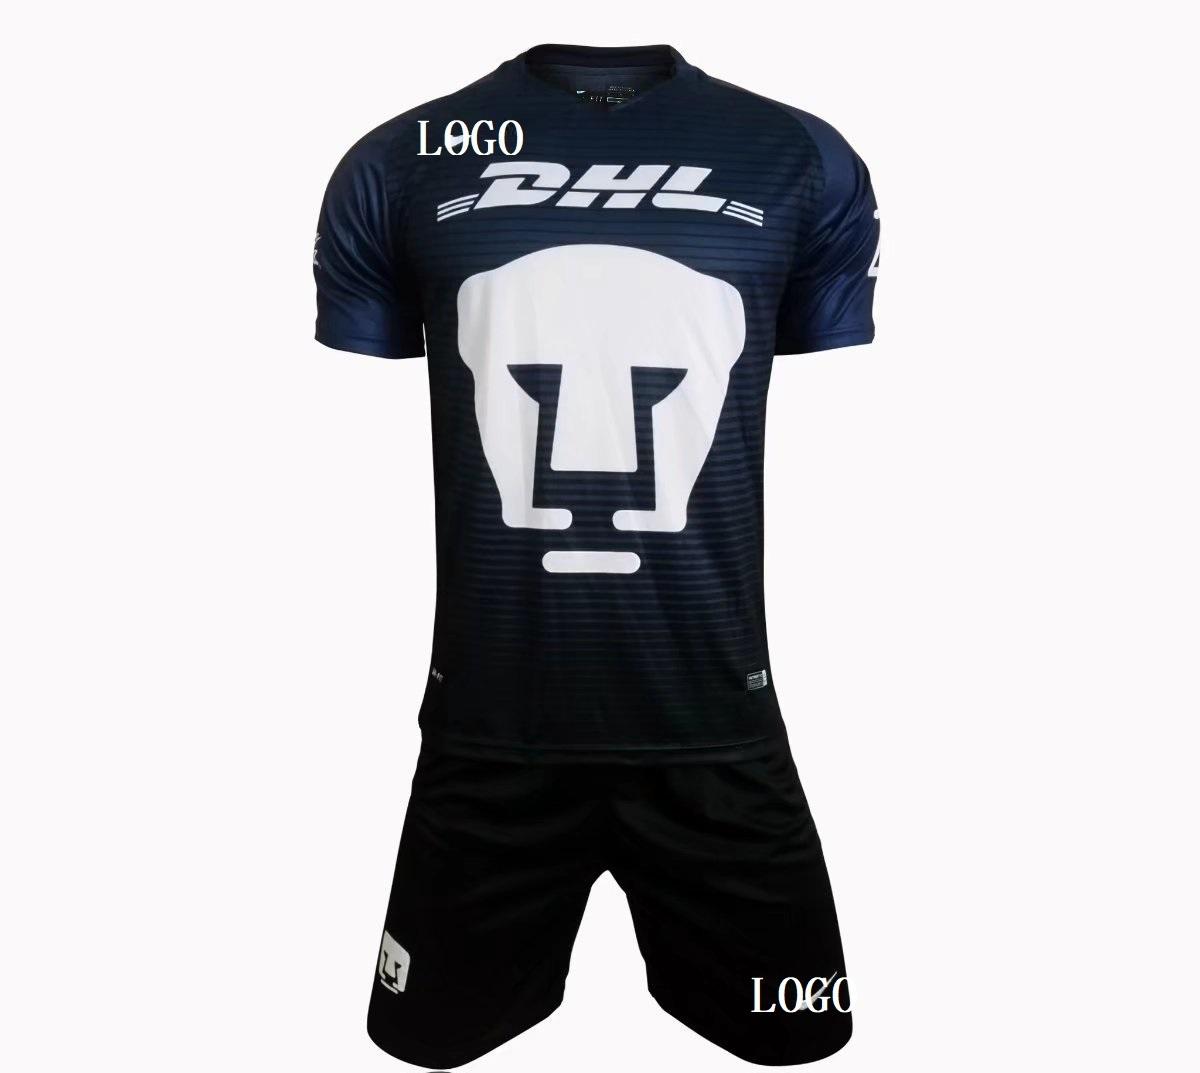 535525e72 2017 2018 Adult Cougar Jersey Uniform Third Away Mexico club UNAM soccer  jerseys kit set camisetas de futbol Item NO  444528